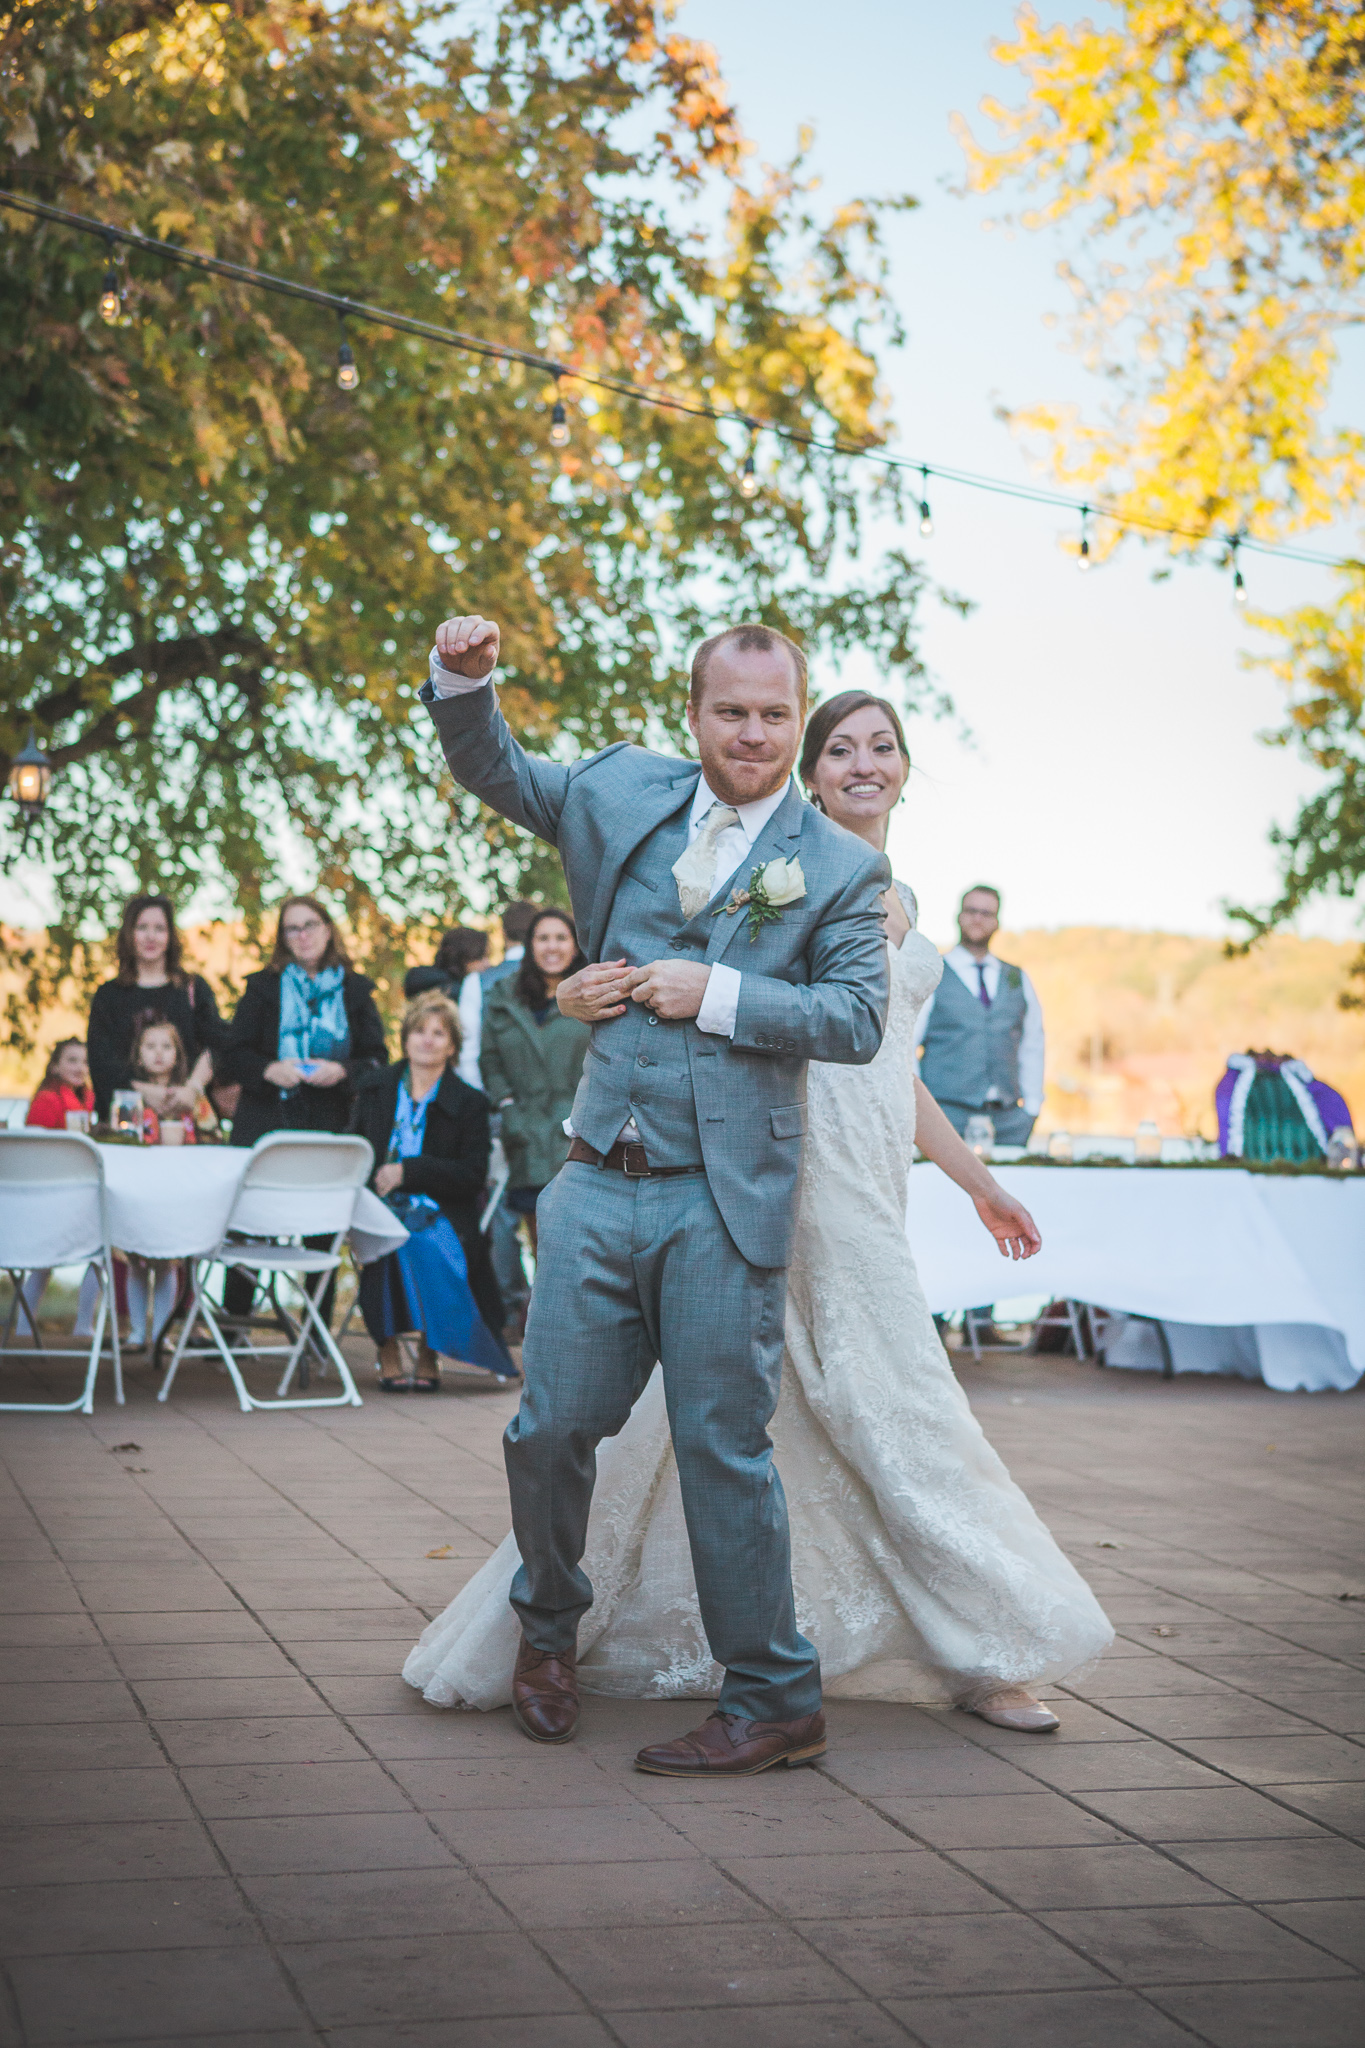 chattanooga-wedding-photographer-inimate-beautiful-tennessee-28.jpg